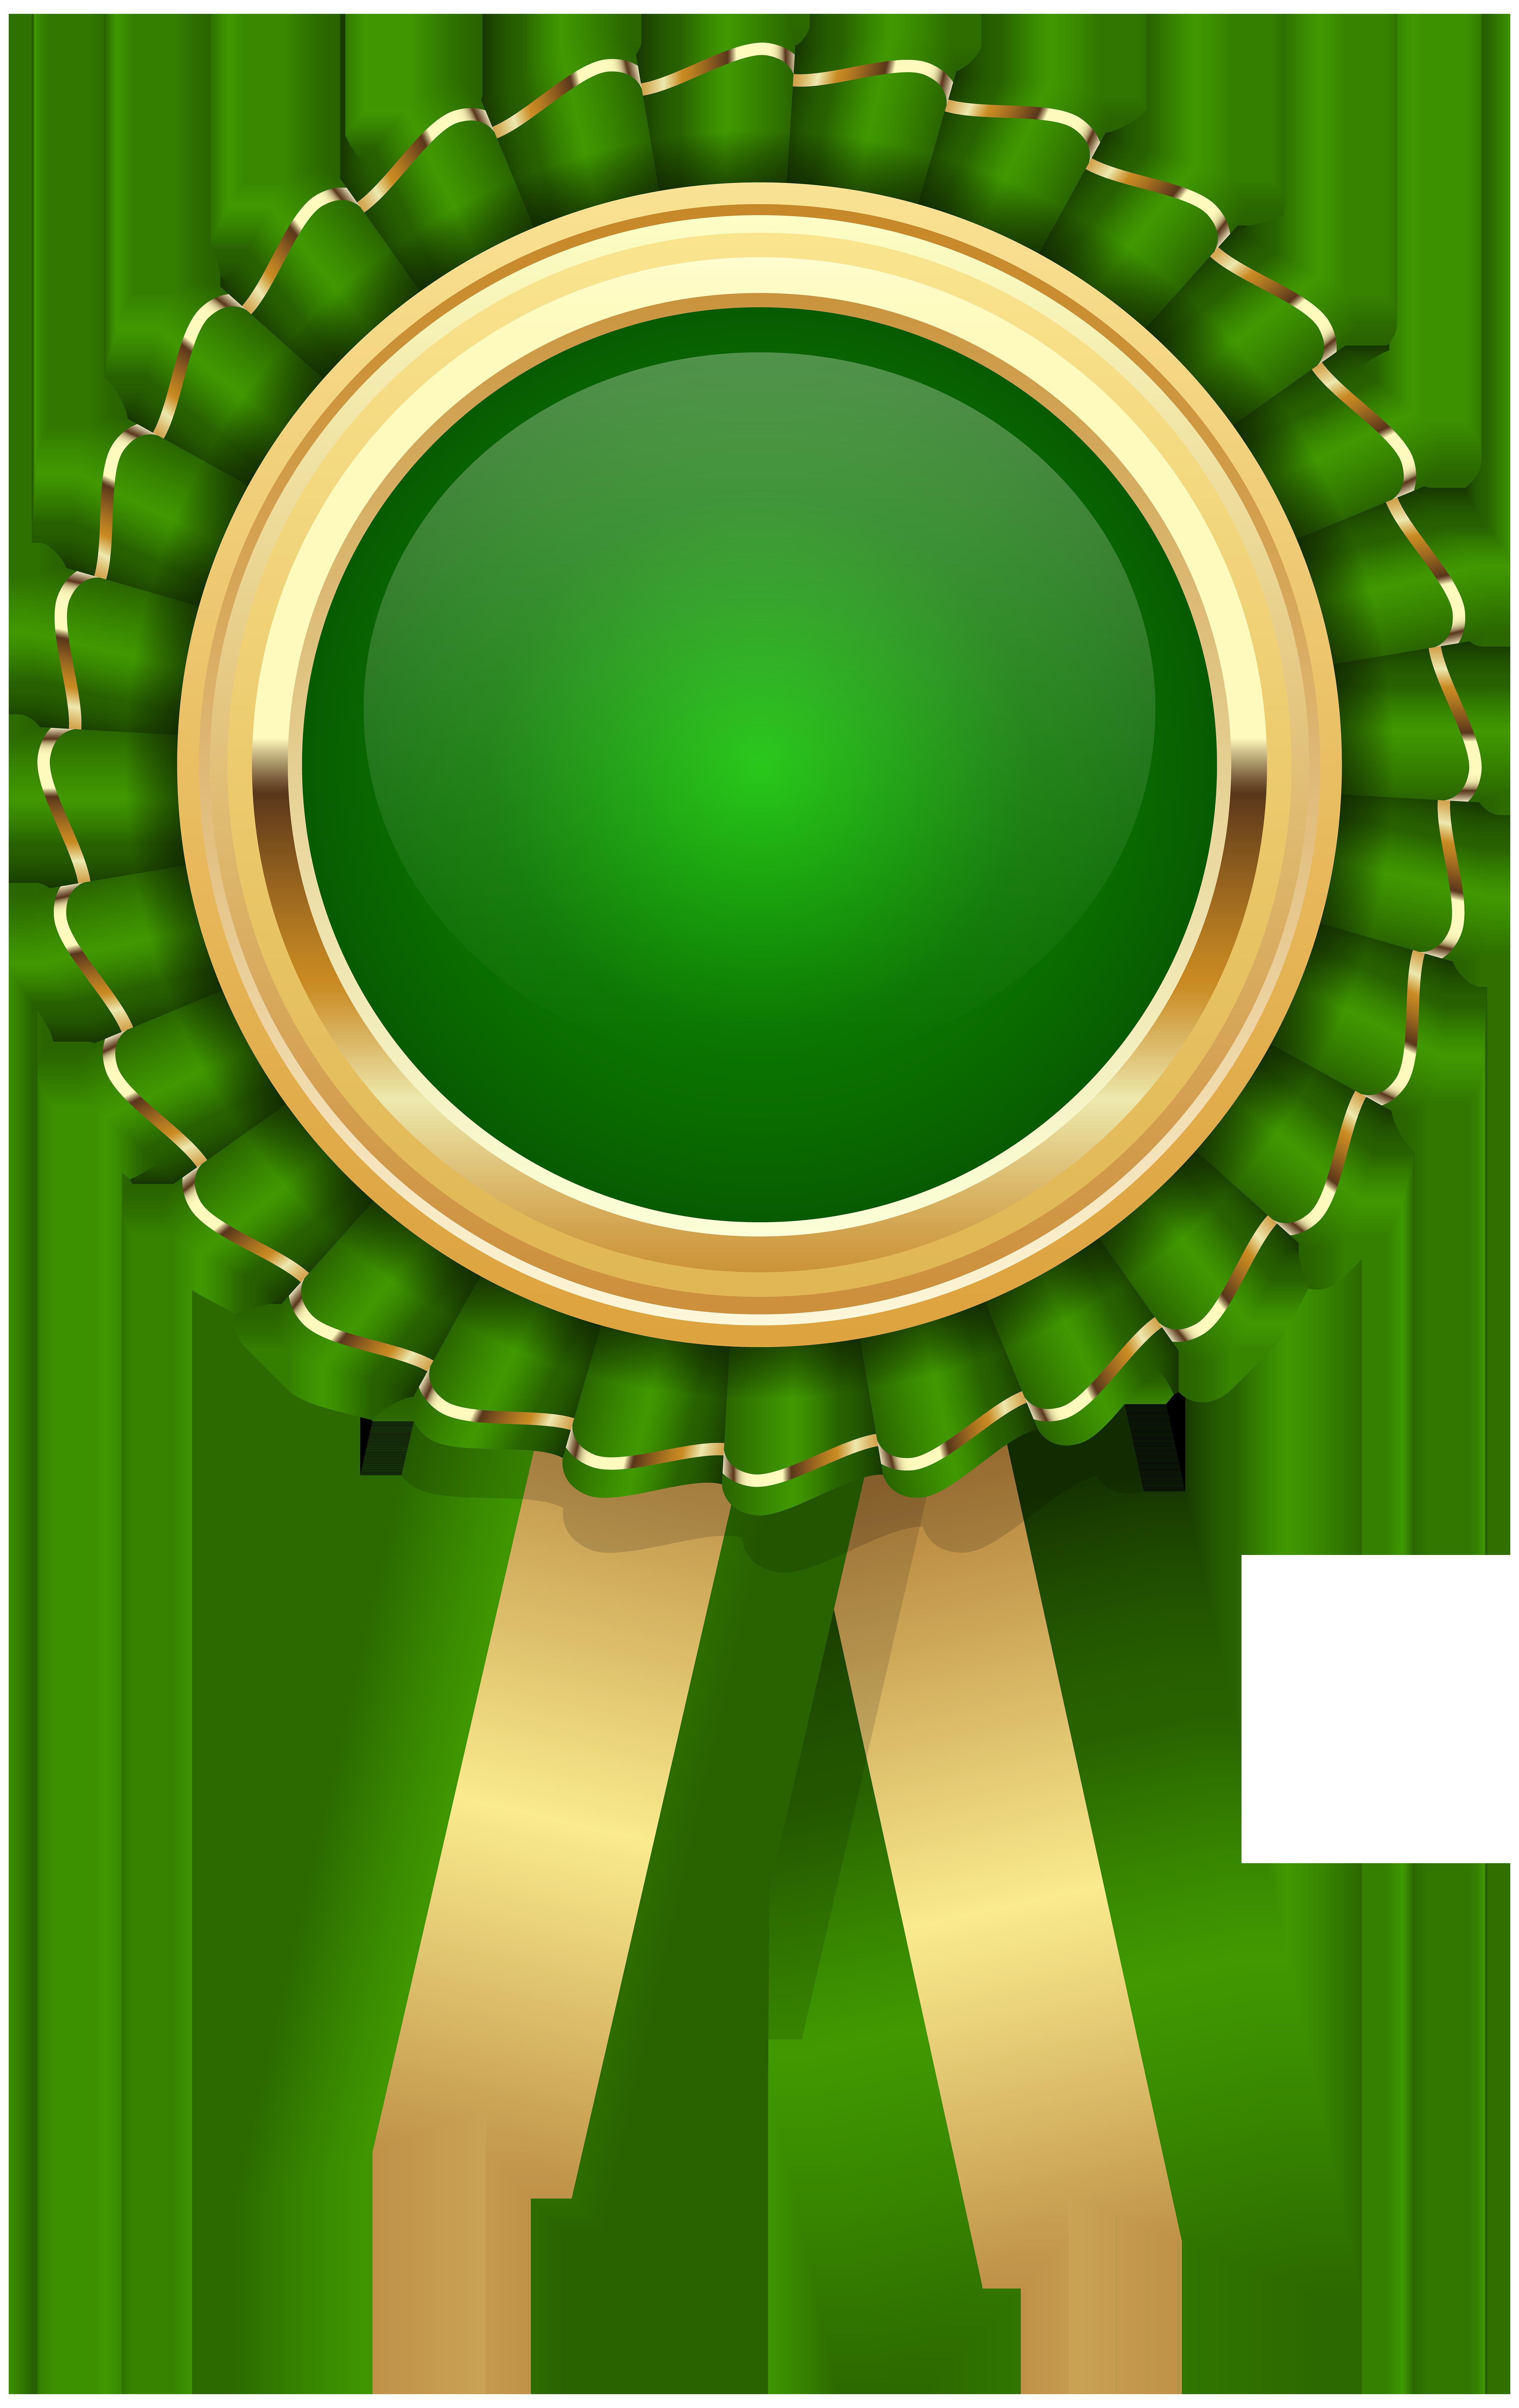 Green Rosette PNG Clip Art Image.